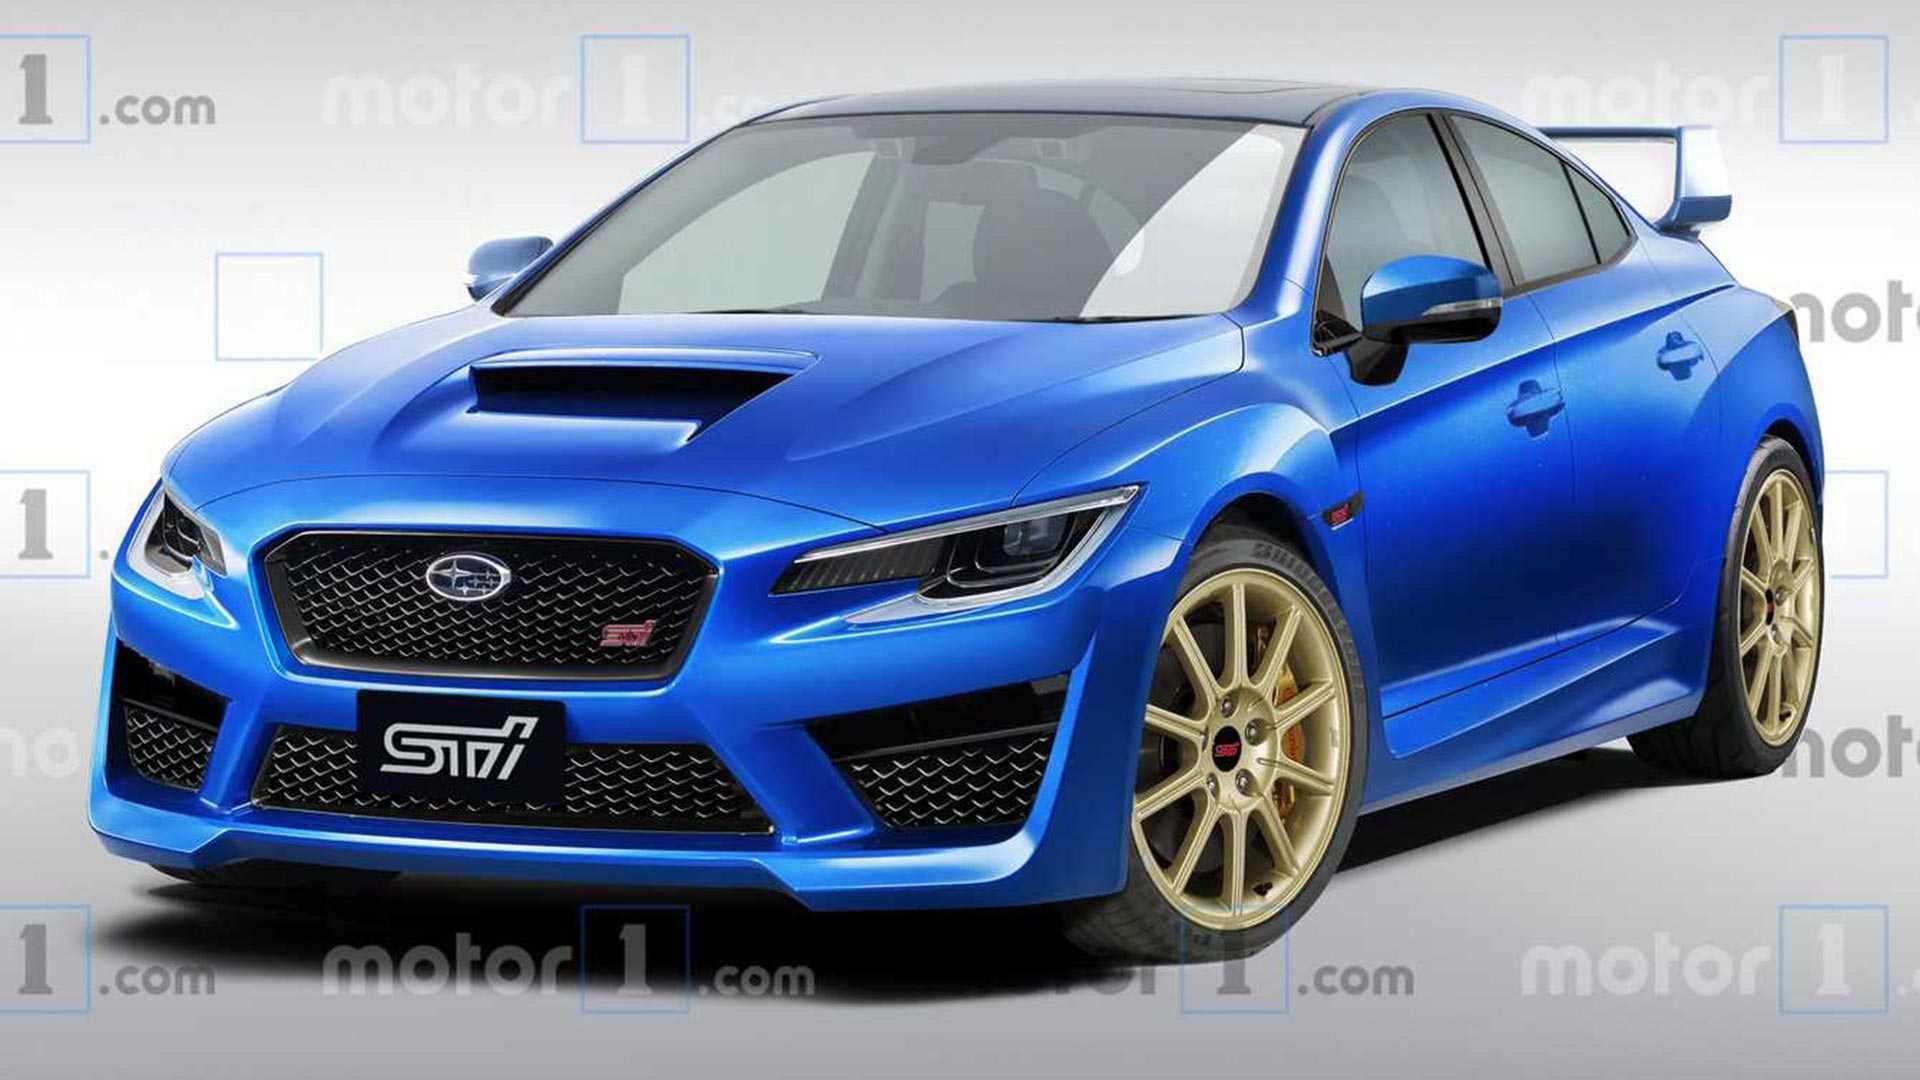 87 All New Subaru New Wrx 2020 Research New with Subaru New Wrx 2020